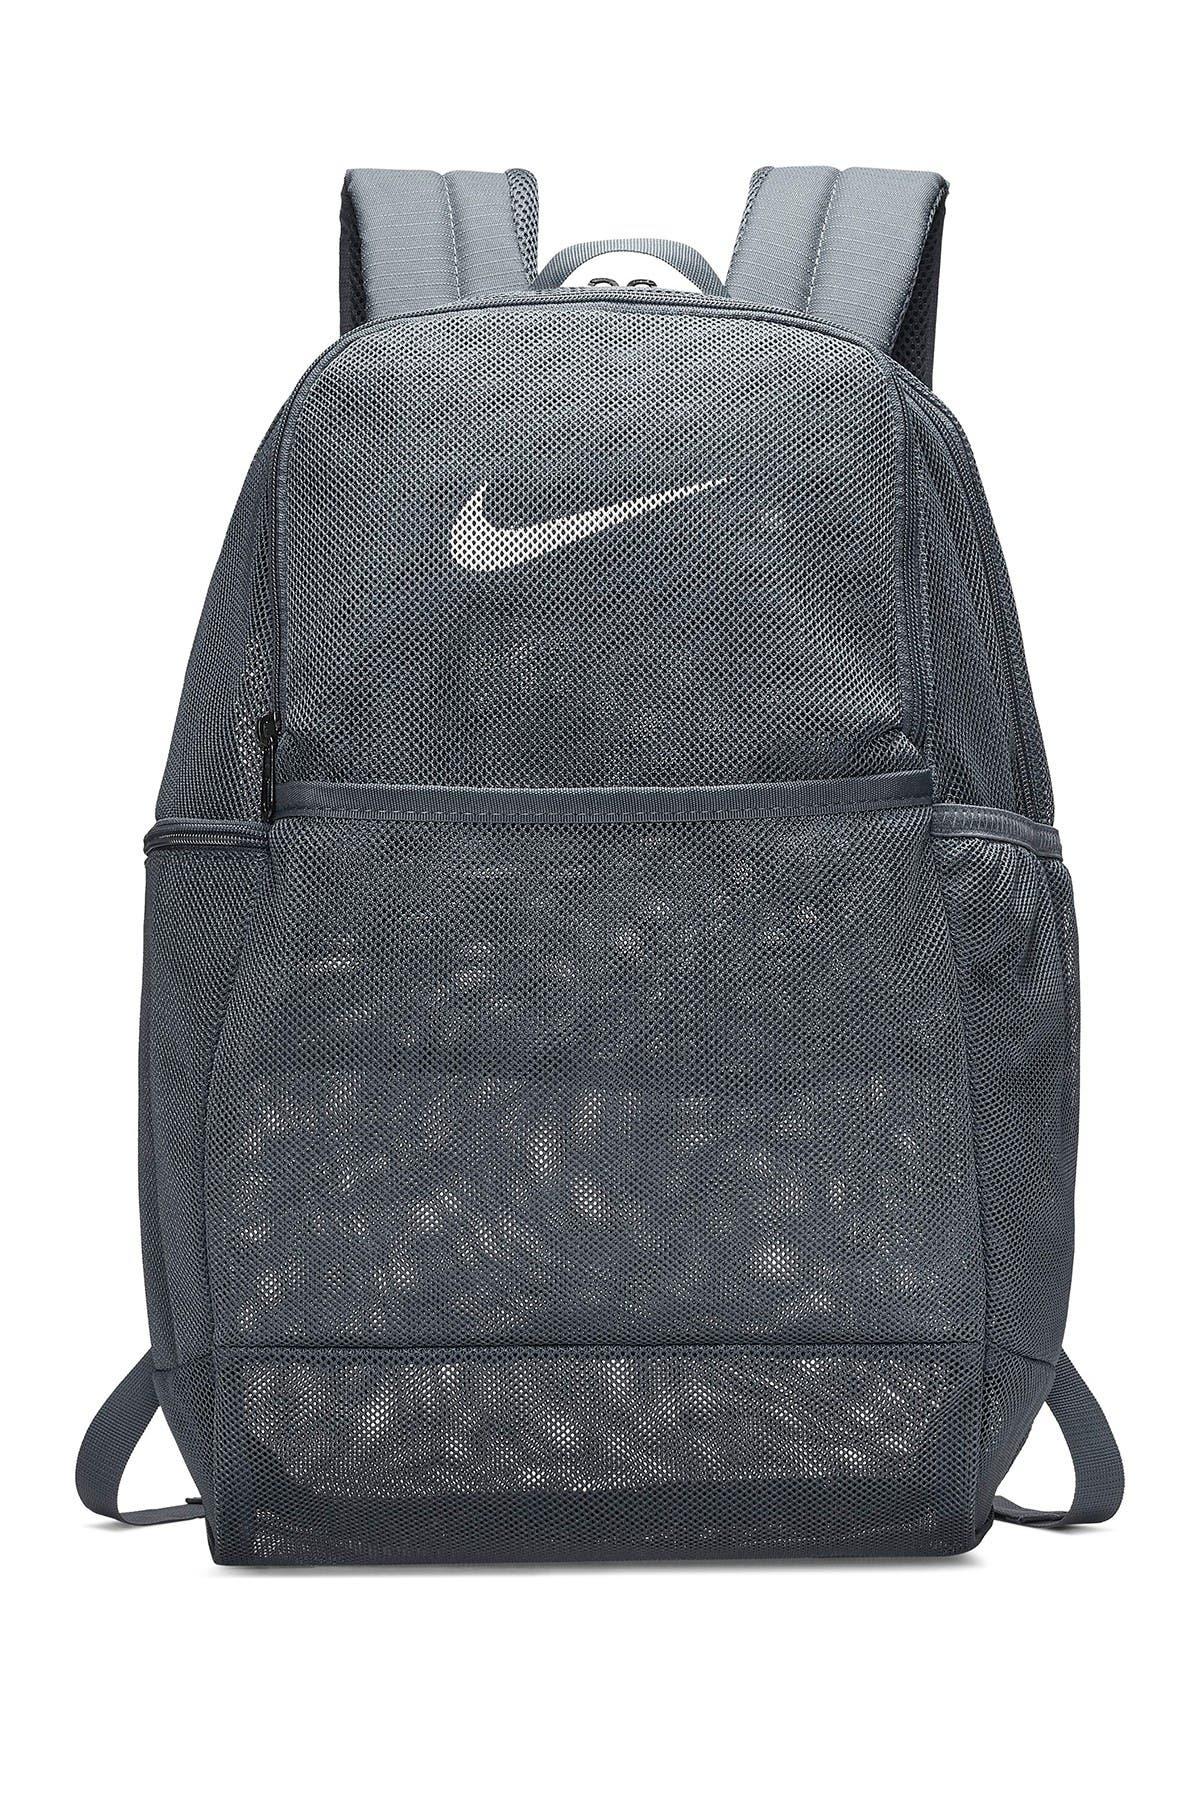 يحول دون لافتة عيد الميلاد Womens Nike Brasilia 6 Mesh Backpack Psidiagnosticins Com